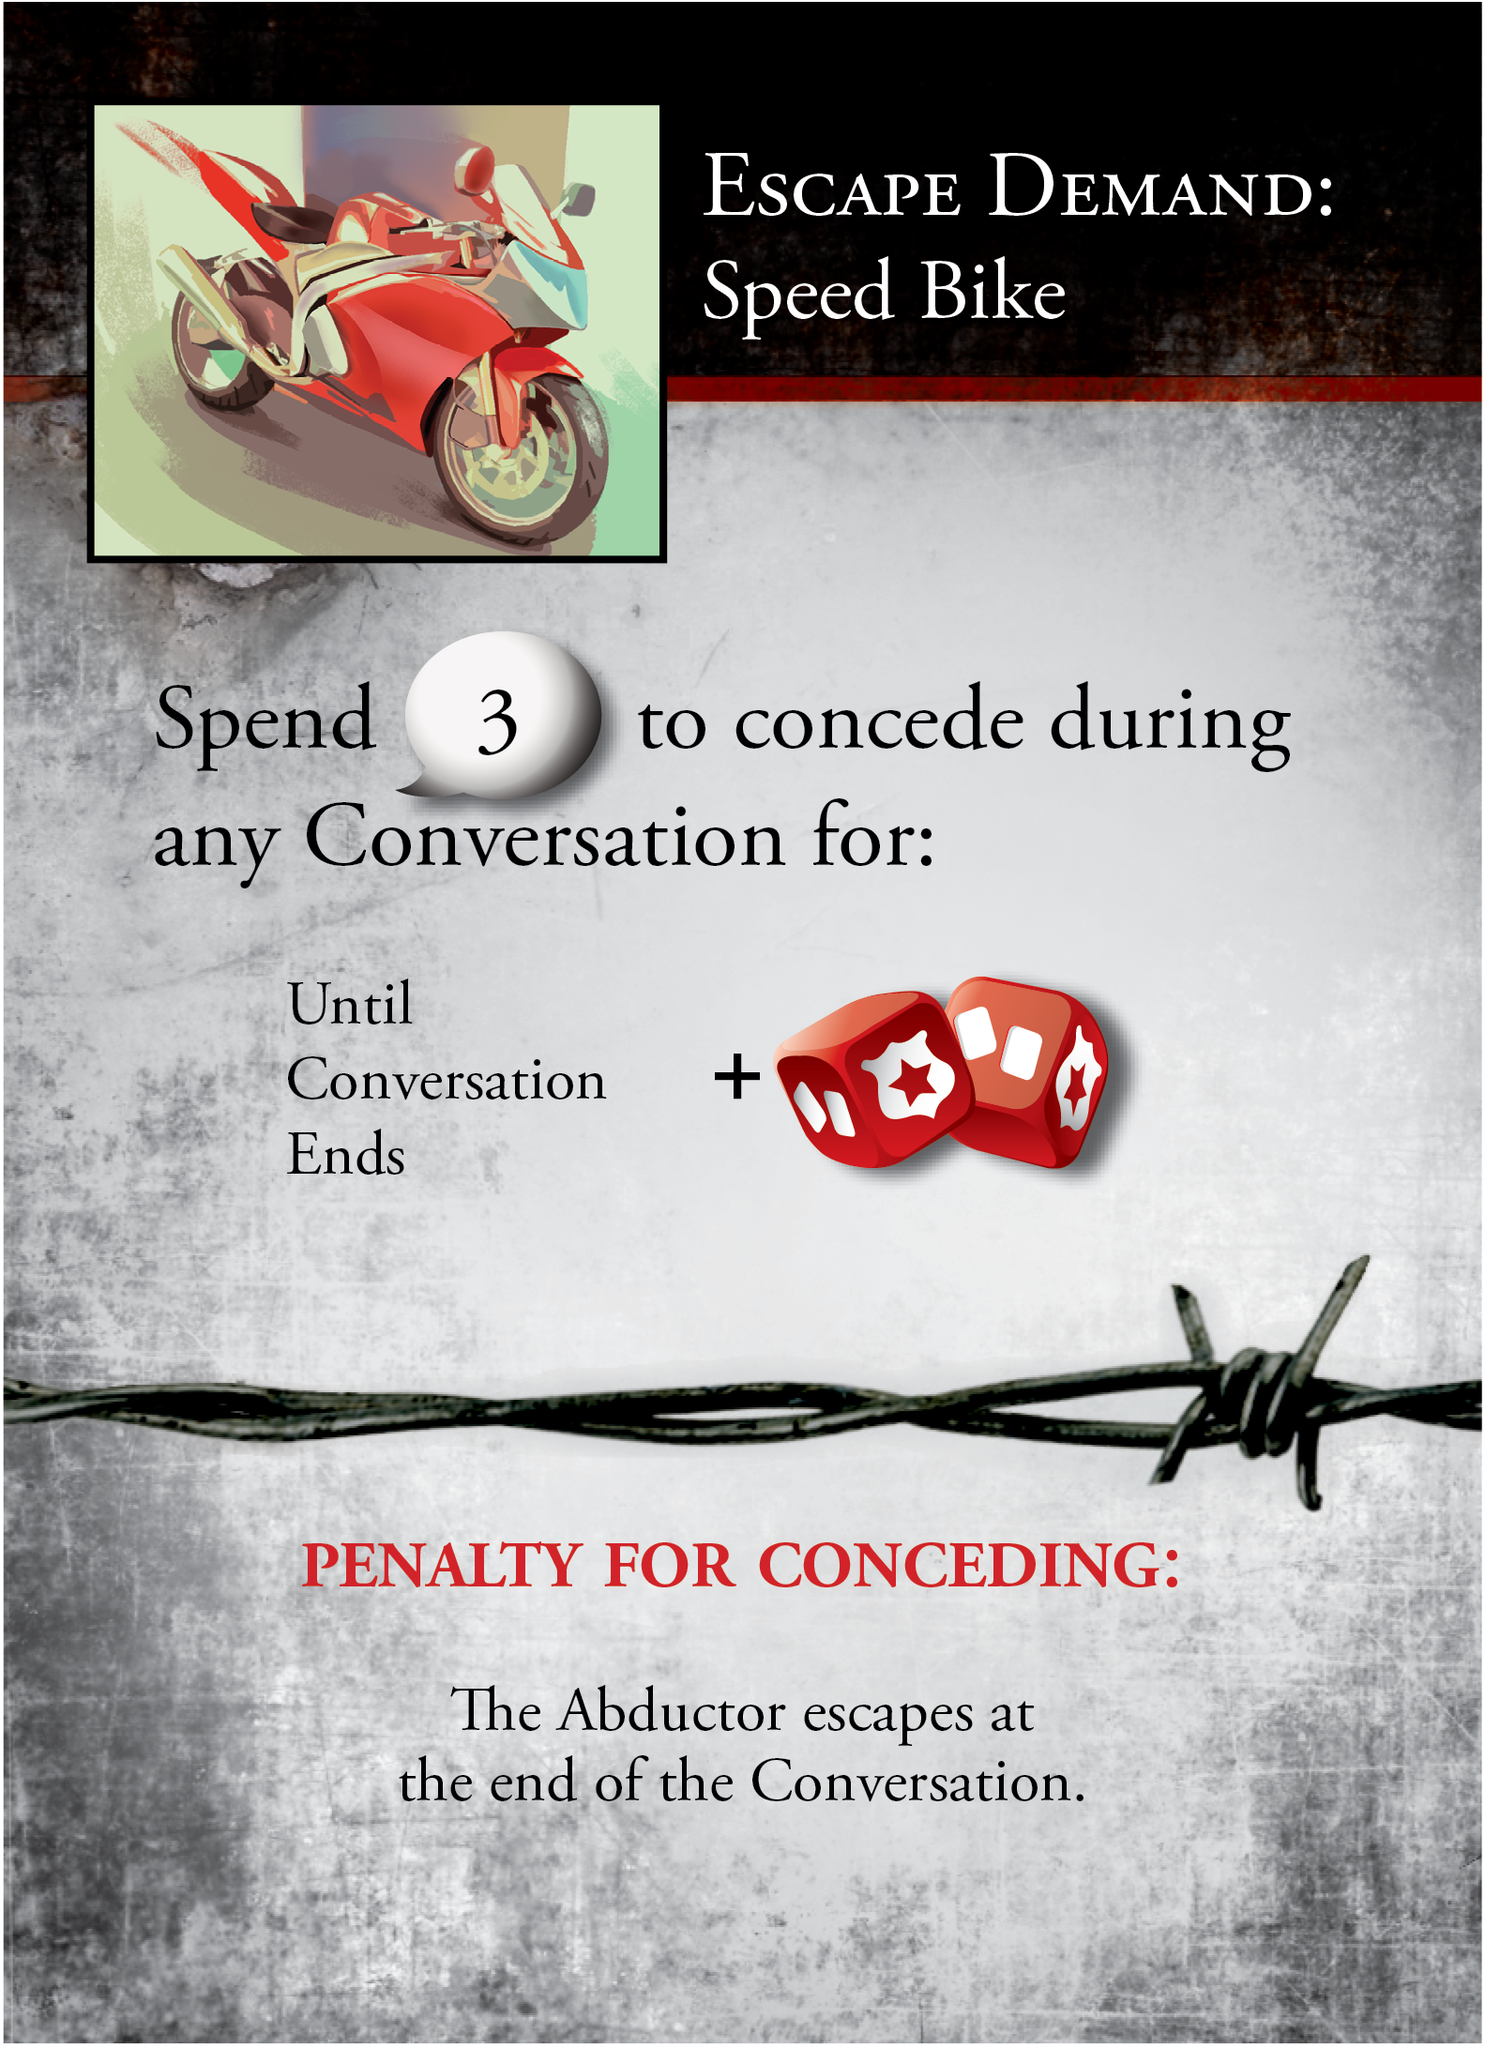 Speed Bike.png